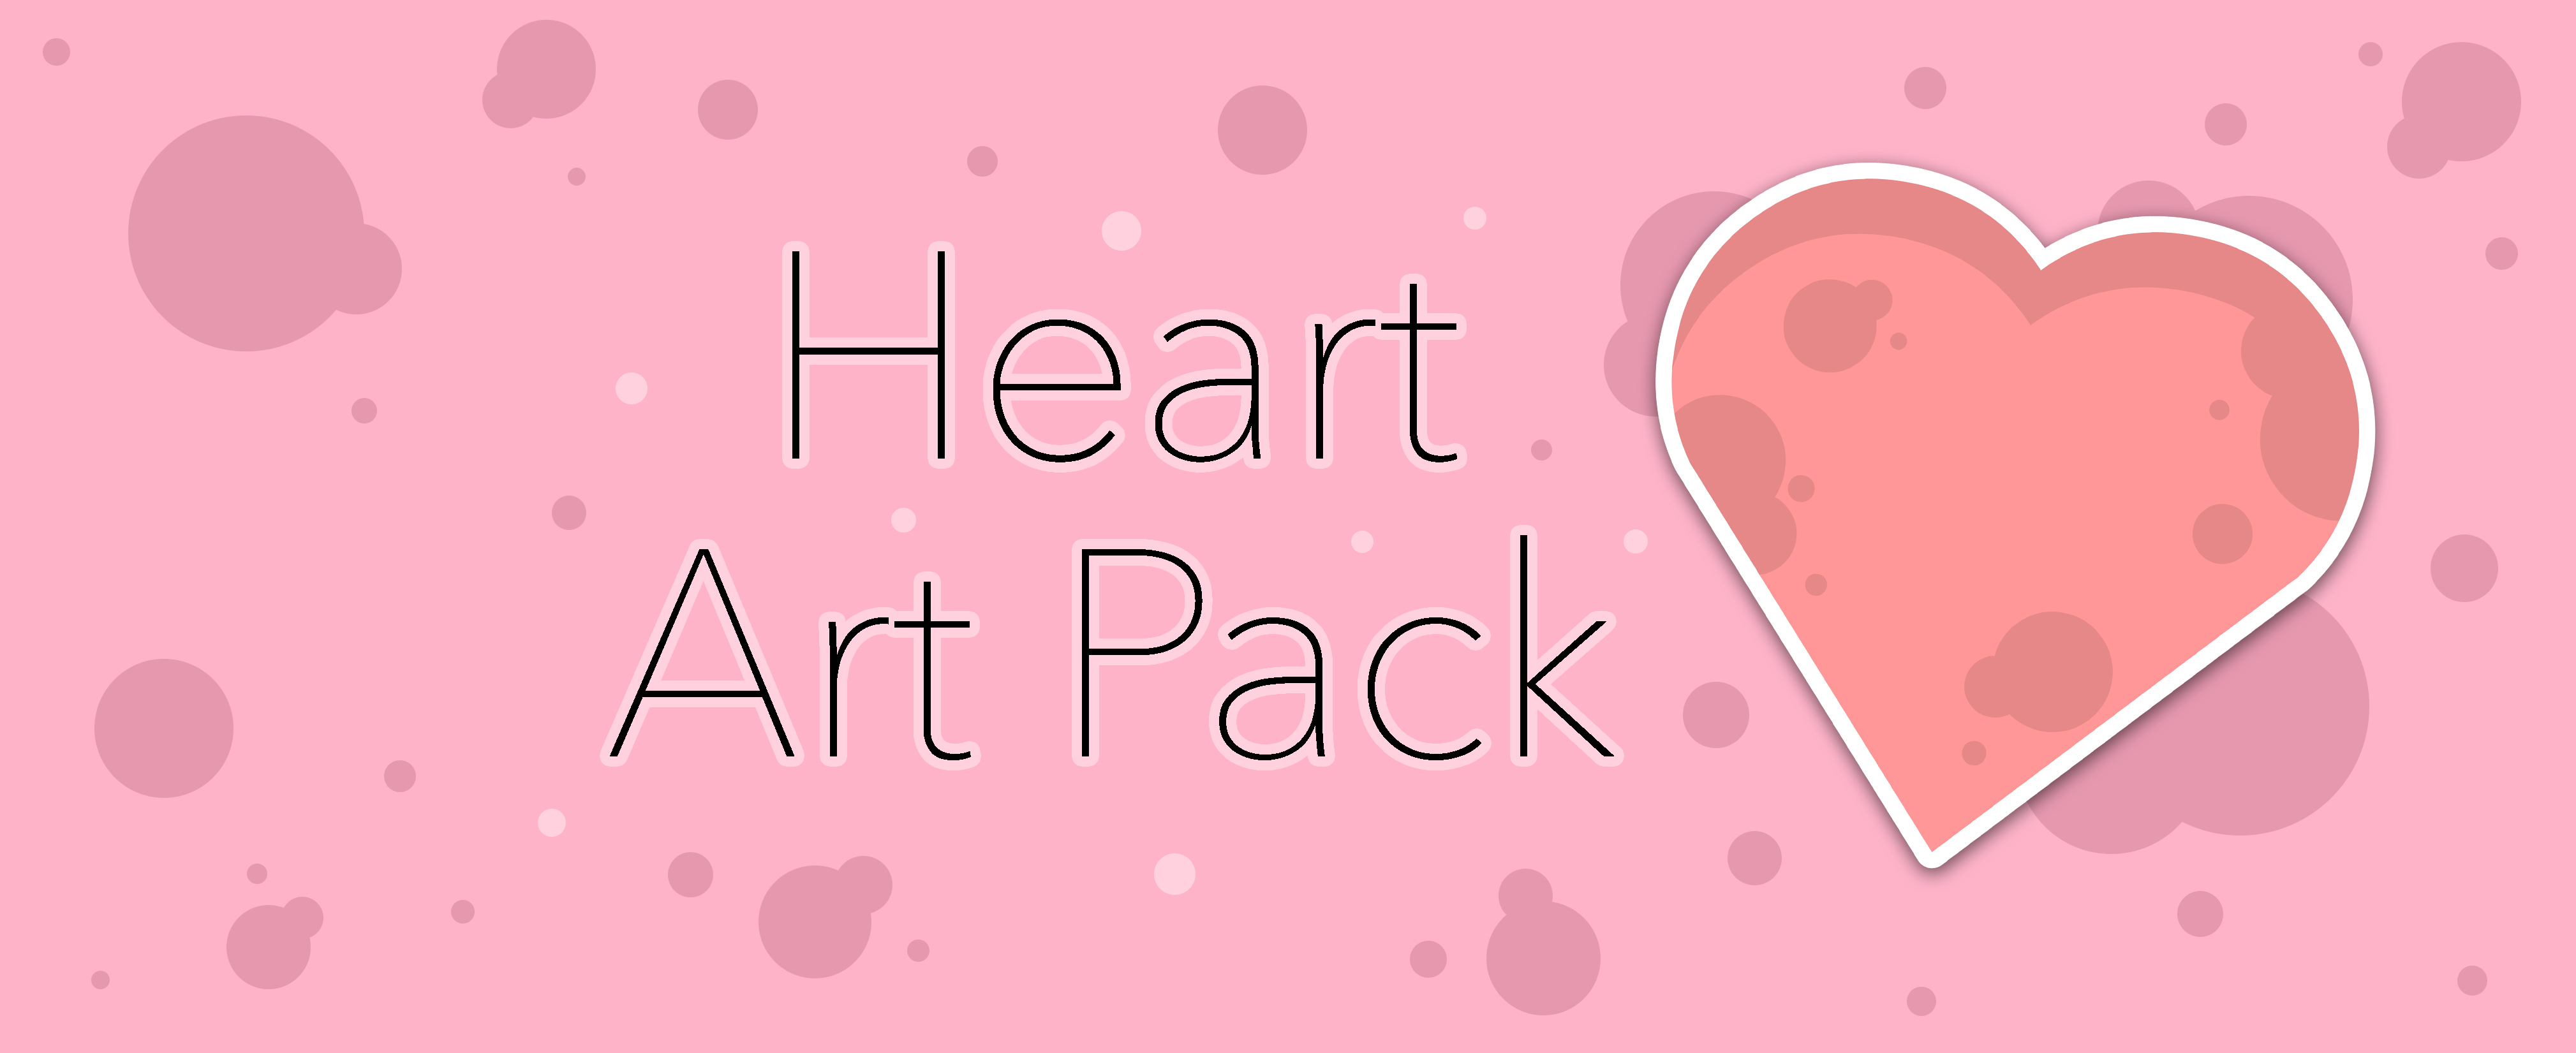 Heart Art Pack